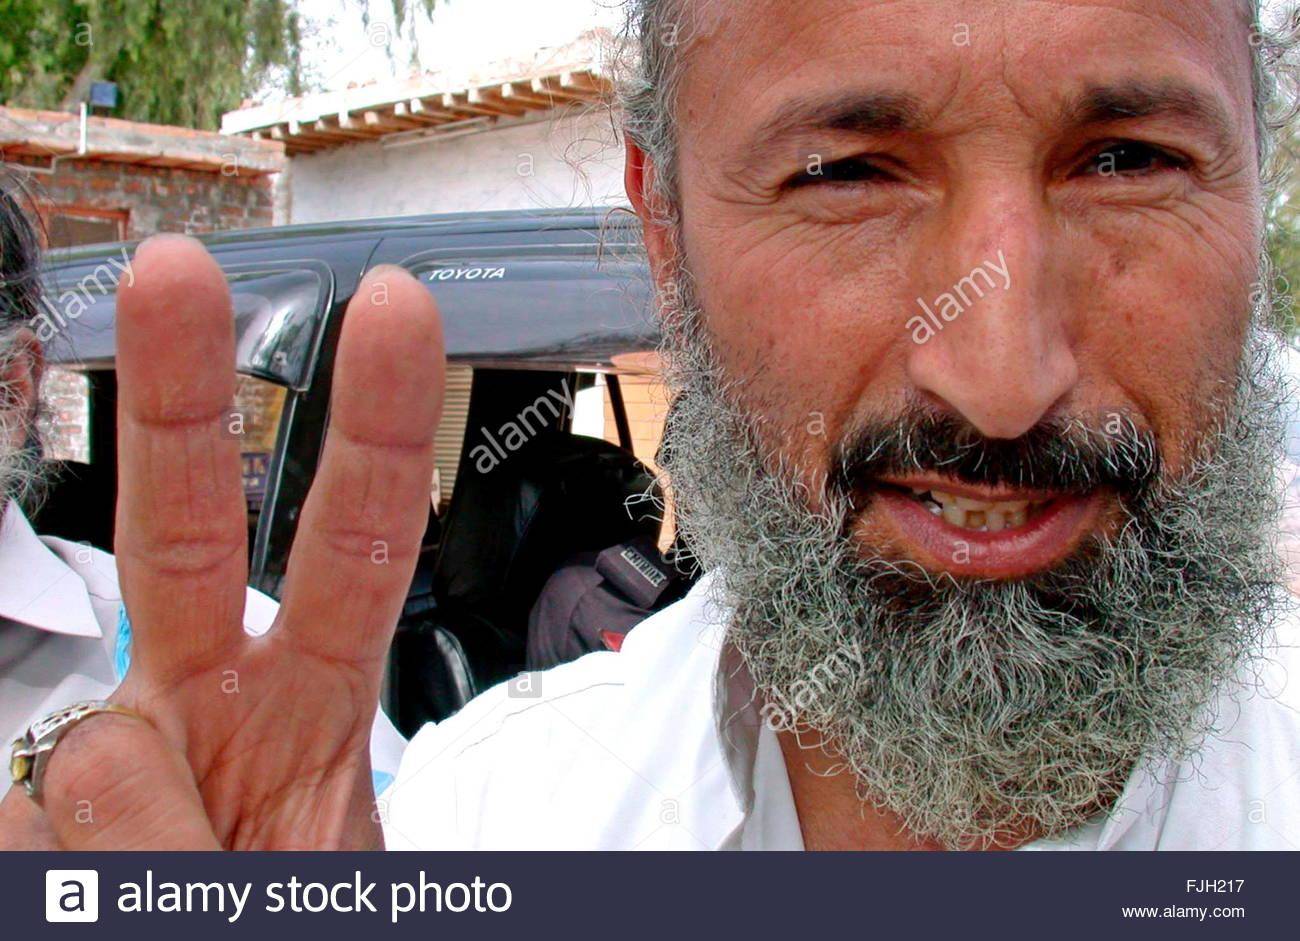 German Muslim Abdul <b>Karim Abdul</b> Haq, who was arrested two years ago, ... - german-muslim-abdul-karim-abdul-haq-who-was-arrested-two-years-ago-FJH217